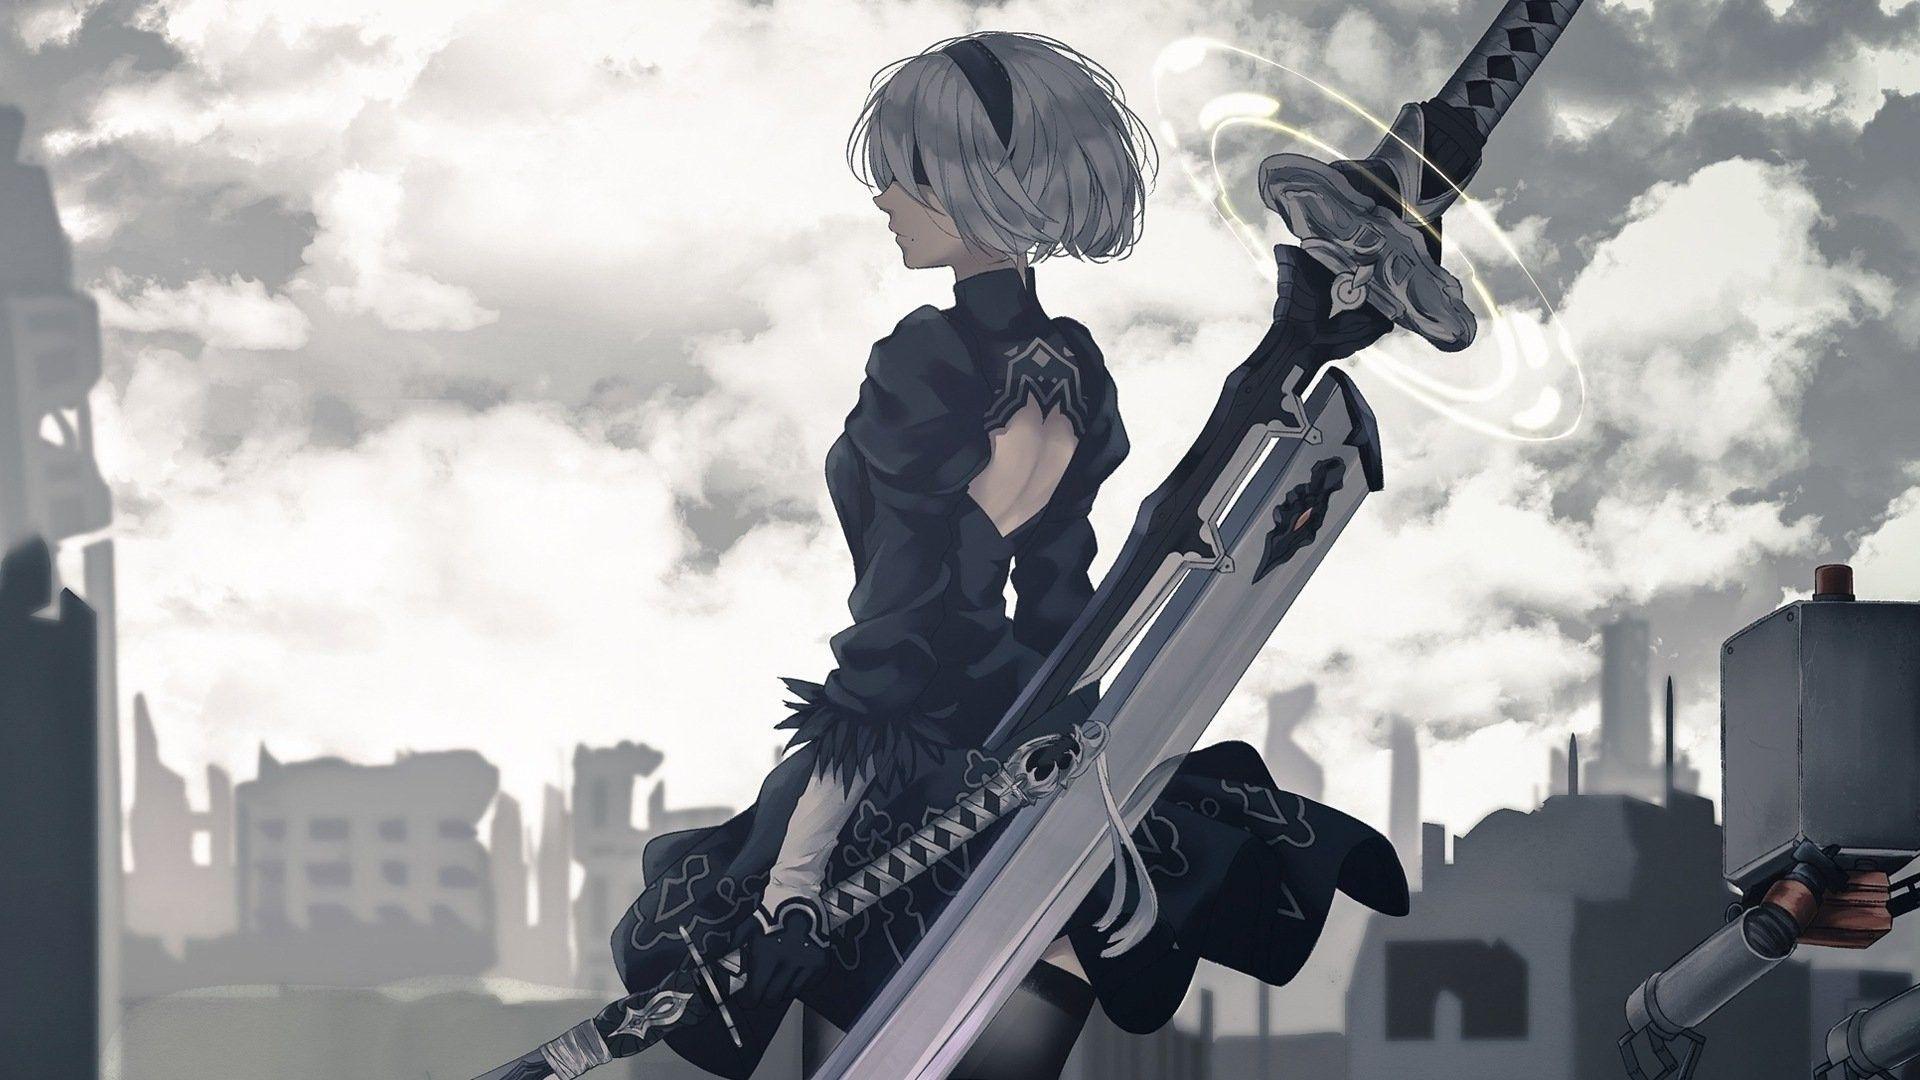 nier automata anime canvas wall poster